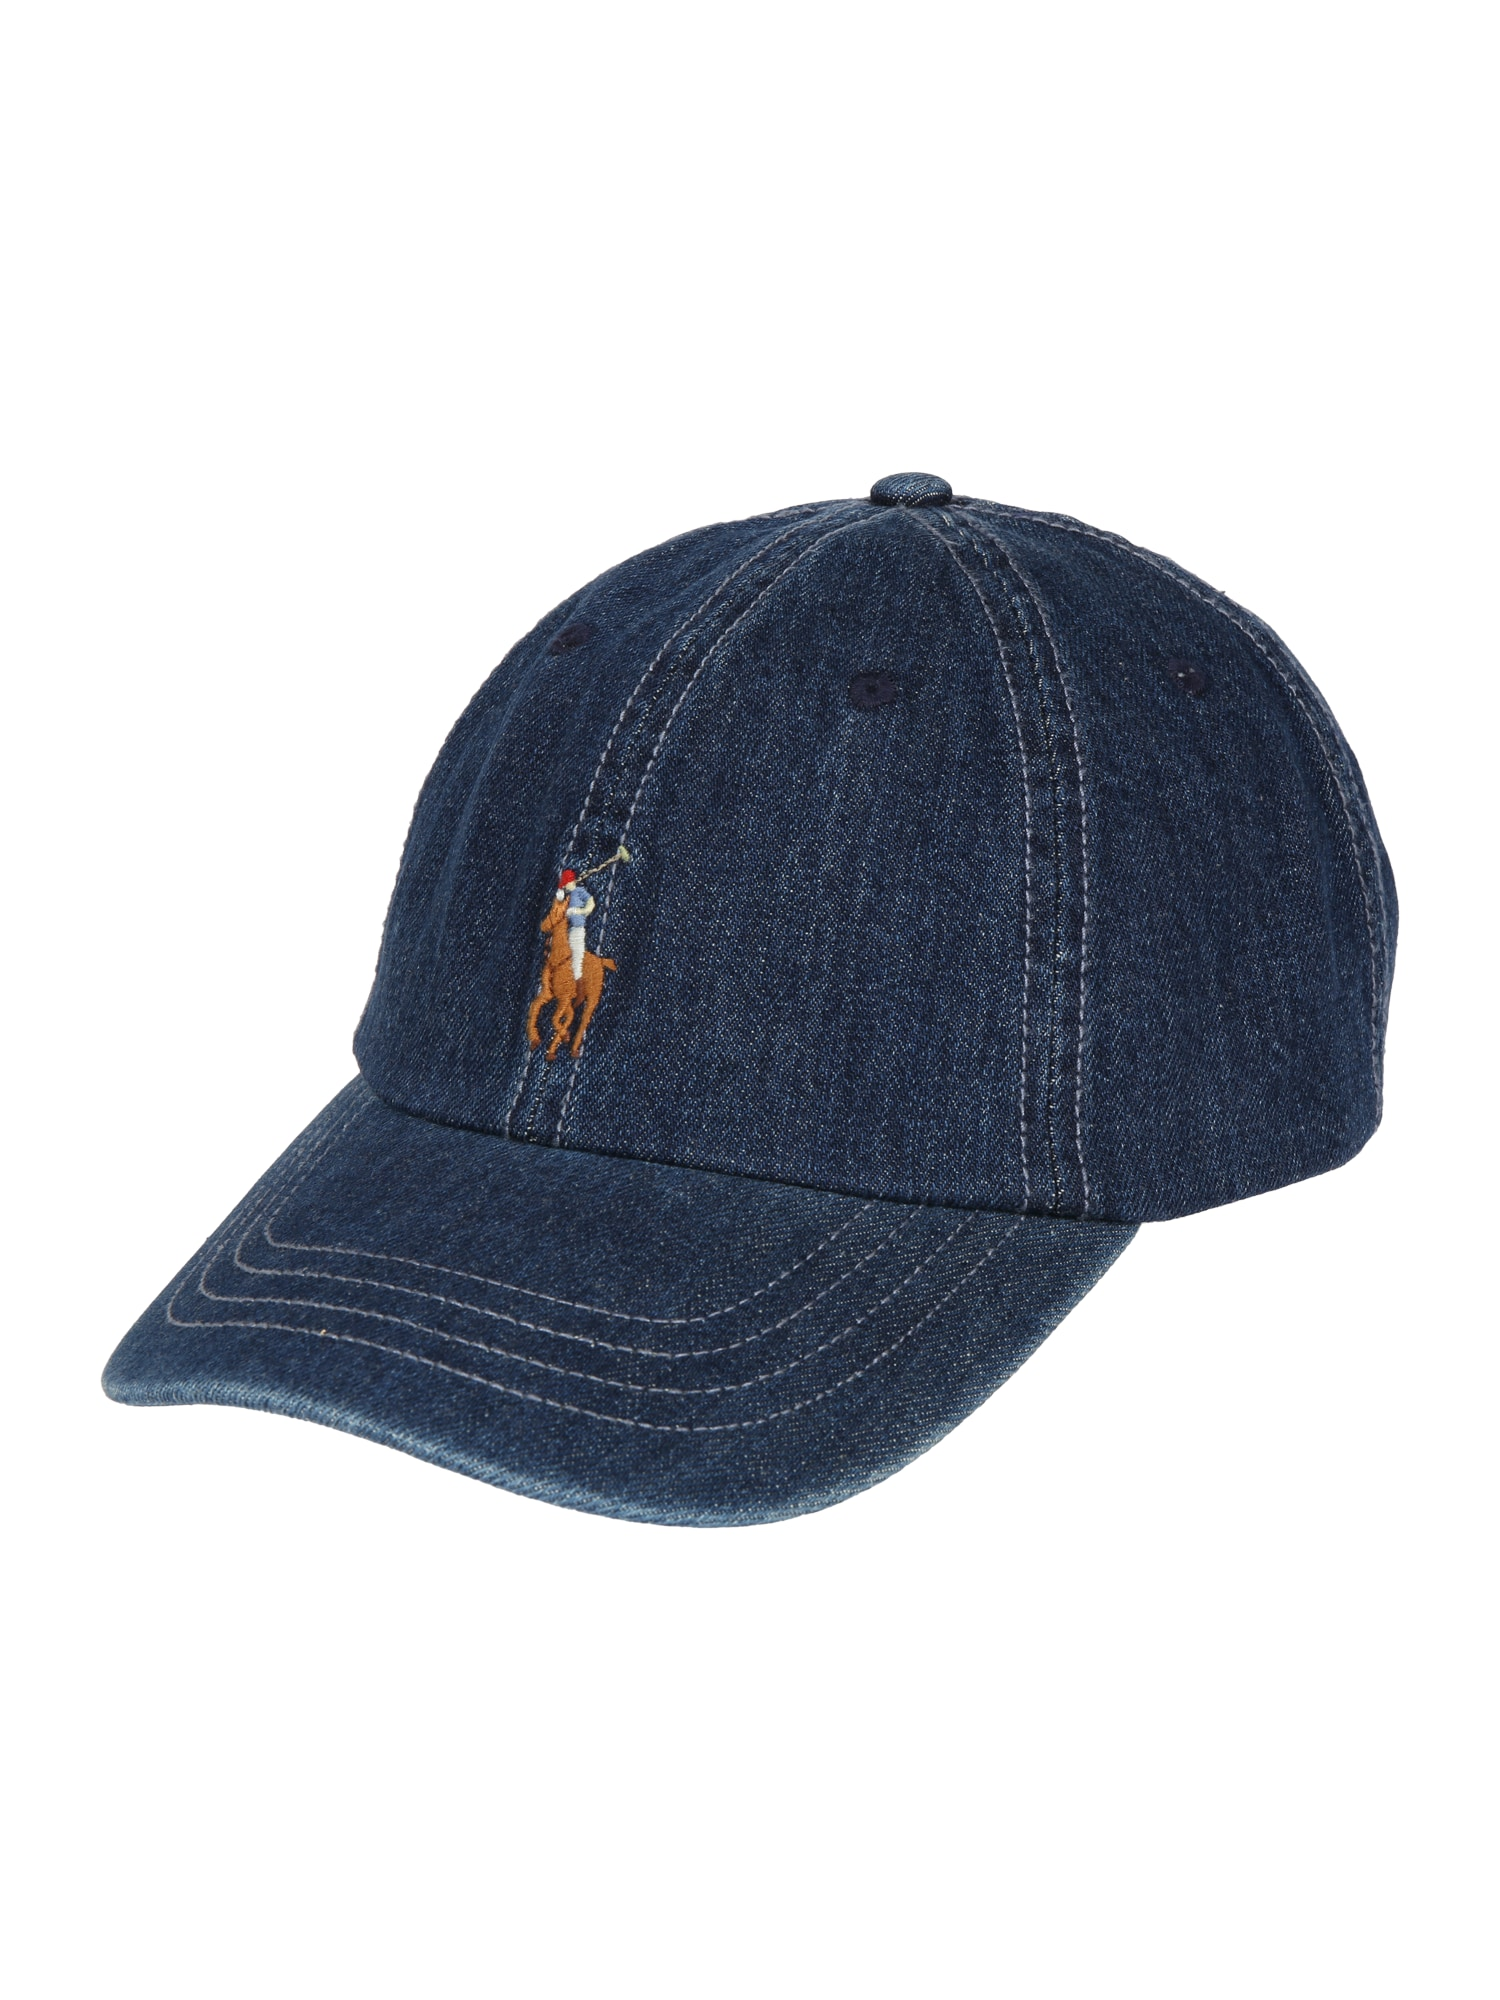 Kšiltovka CLASSIC SPORT CAP W SMALL PP modrá POLO RALPH LAUREN